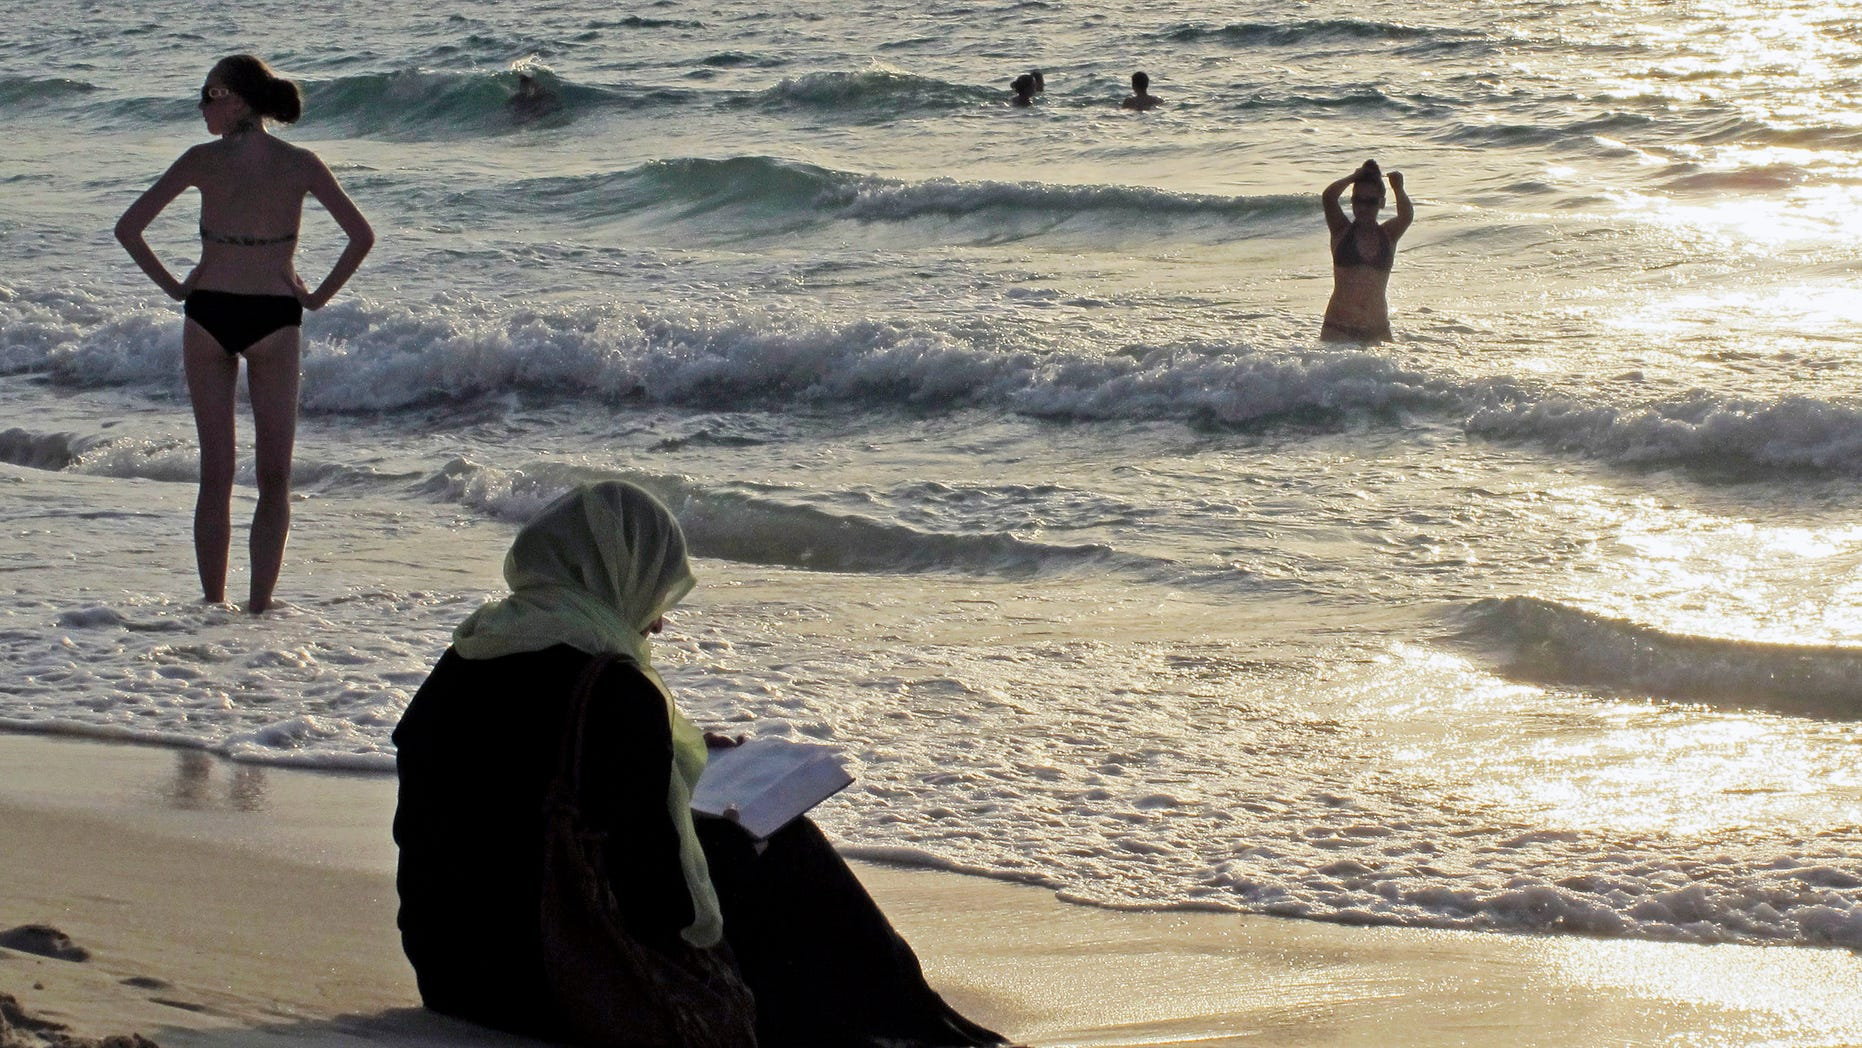 Sept. 6, 2012 - FILE photo of a woman reading the Koran on a beach as people in bikinis sunbathe and swim at sunset in Dubai, United Arab Emirates.